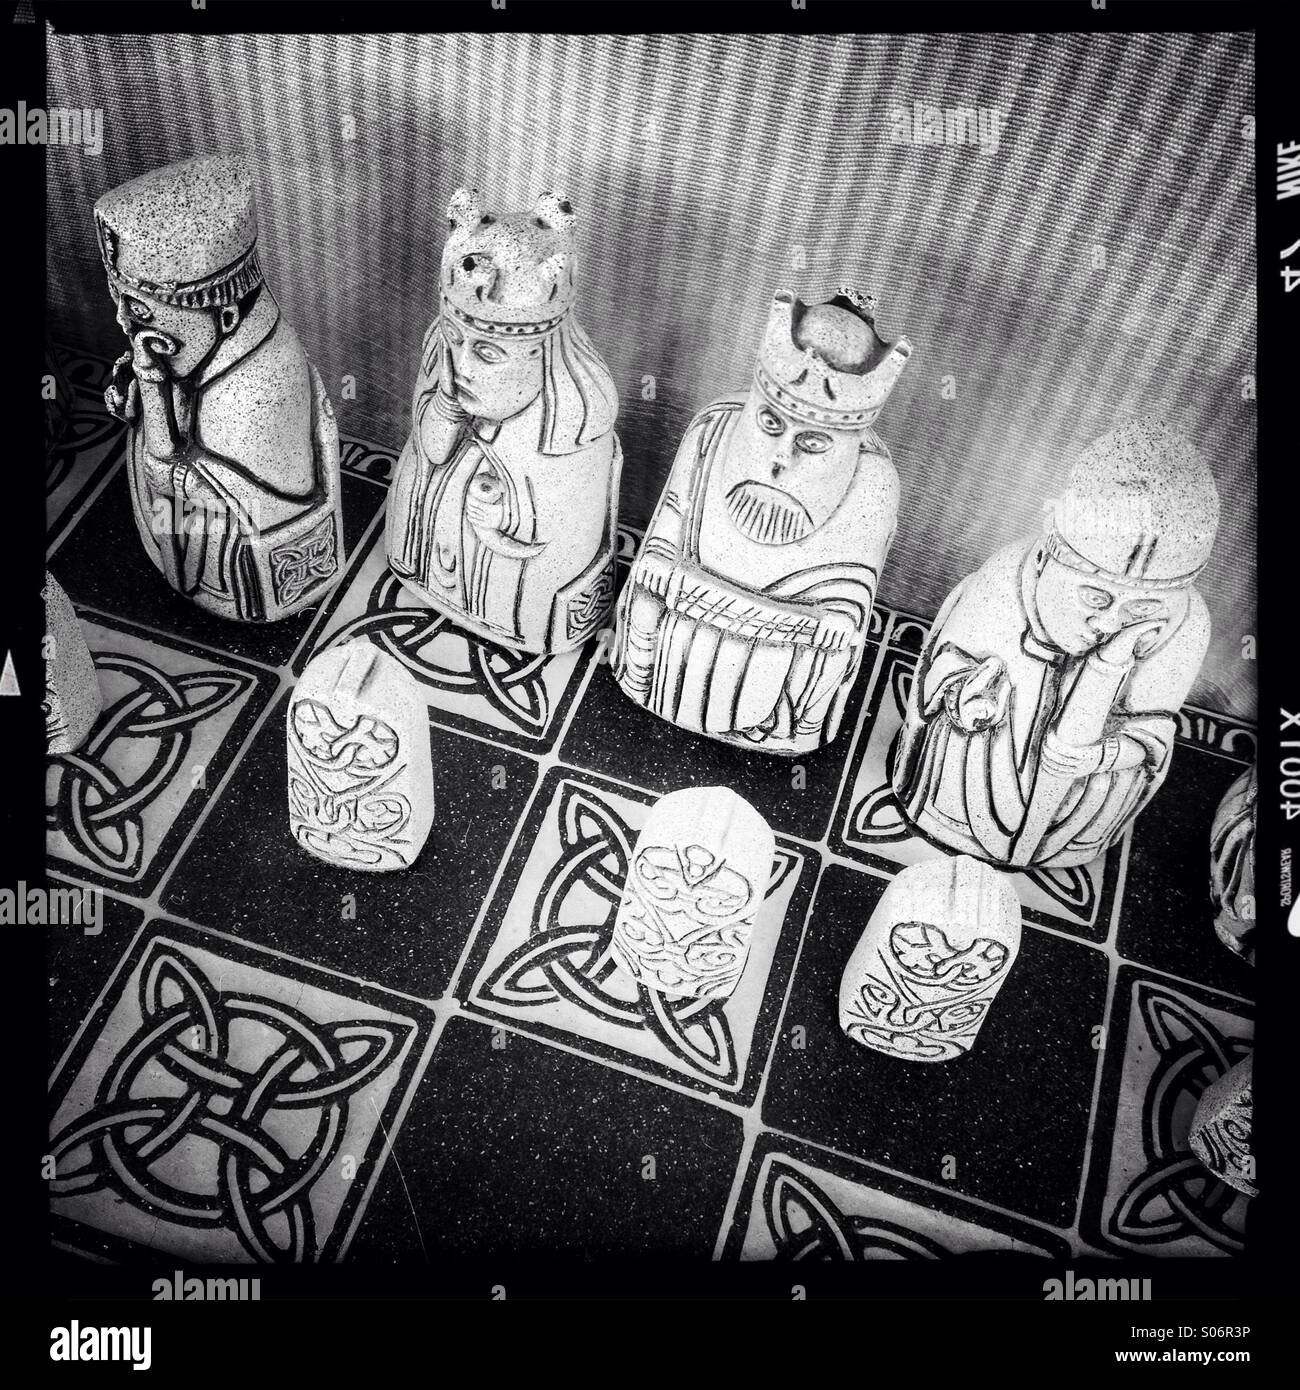 Set of Lewis chessmen - Stock Image